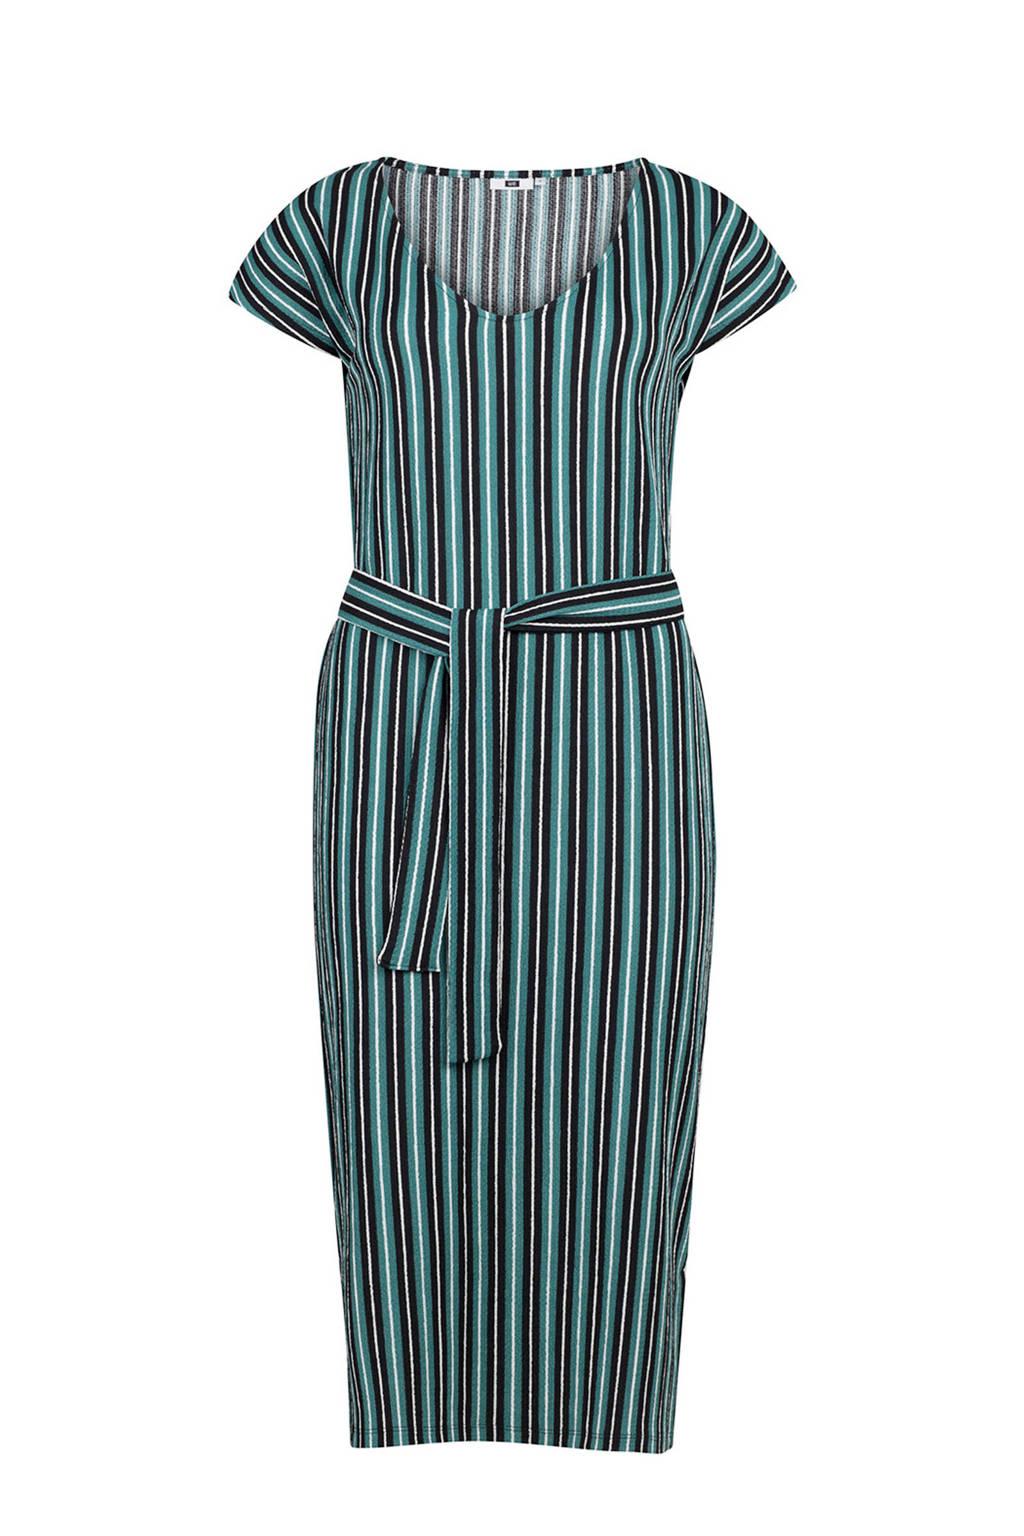 WE Fashion gestreepte jurk met strikdetail petrol, Petrol/zwart